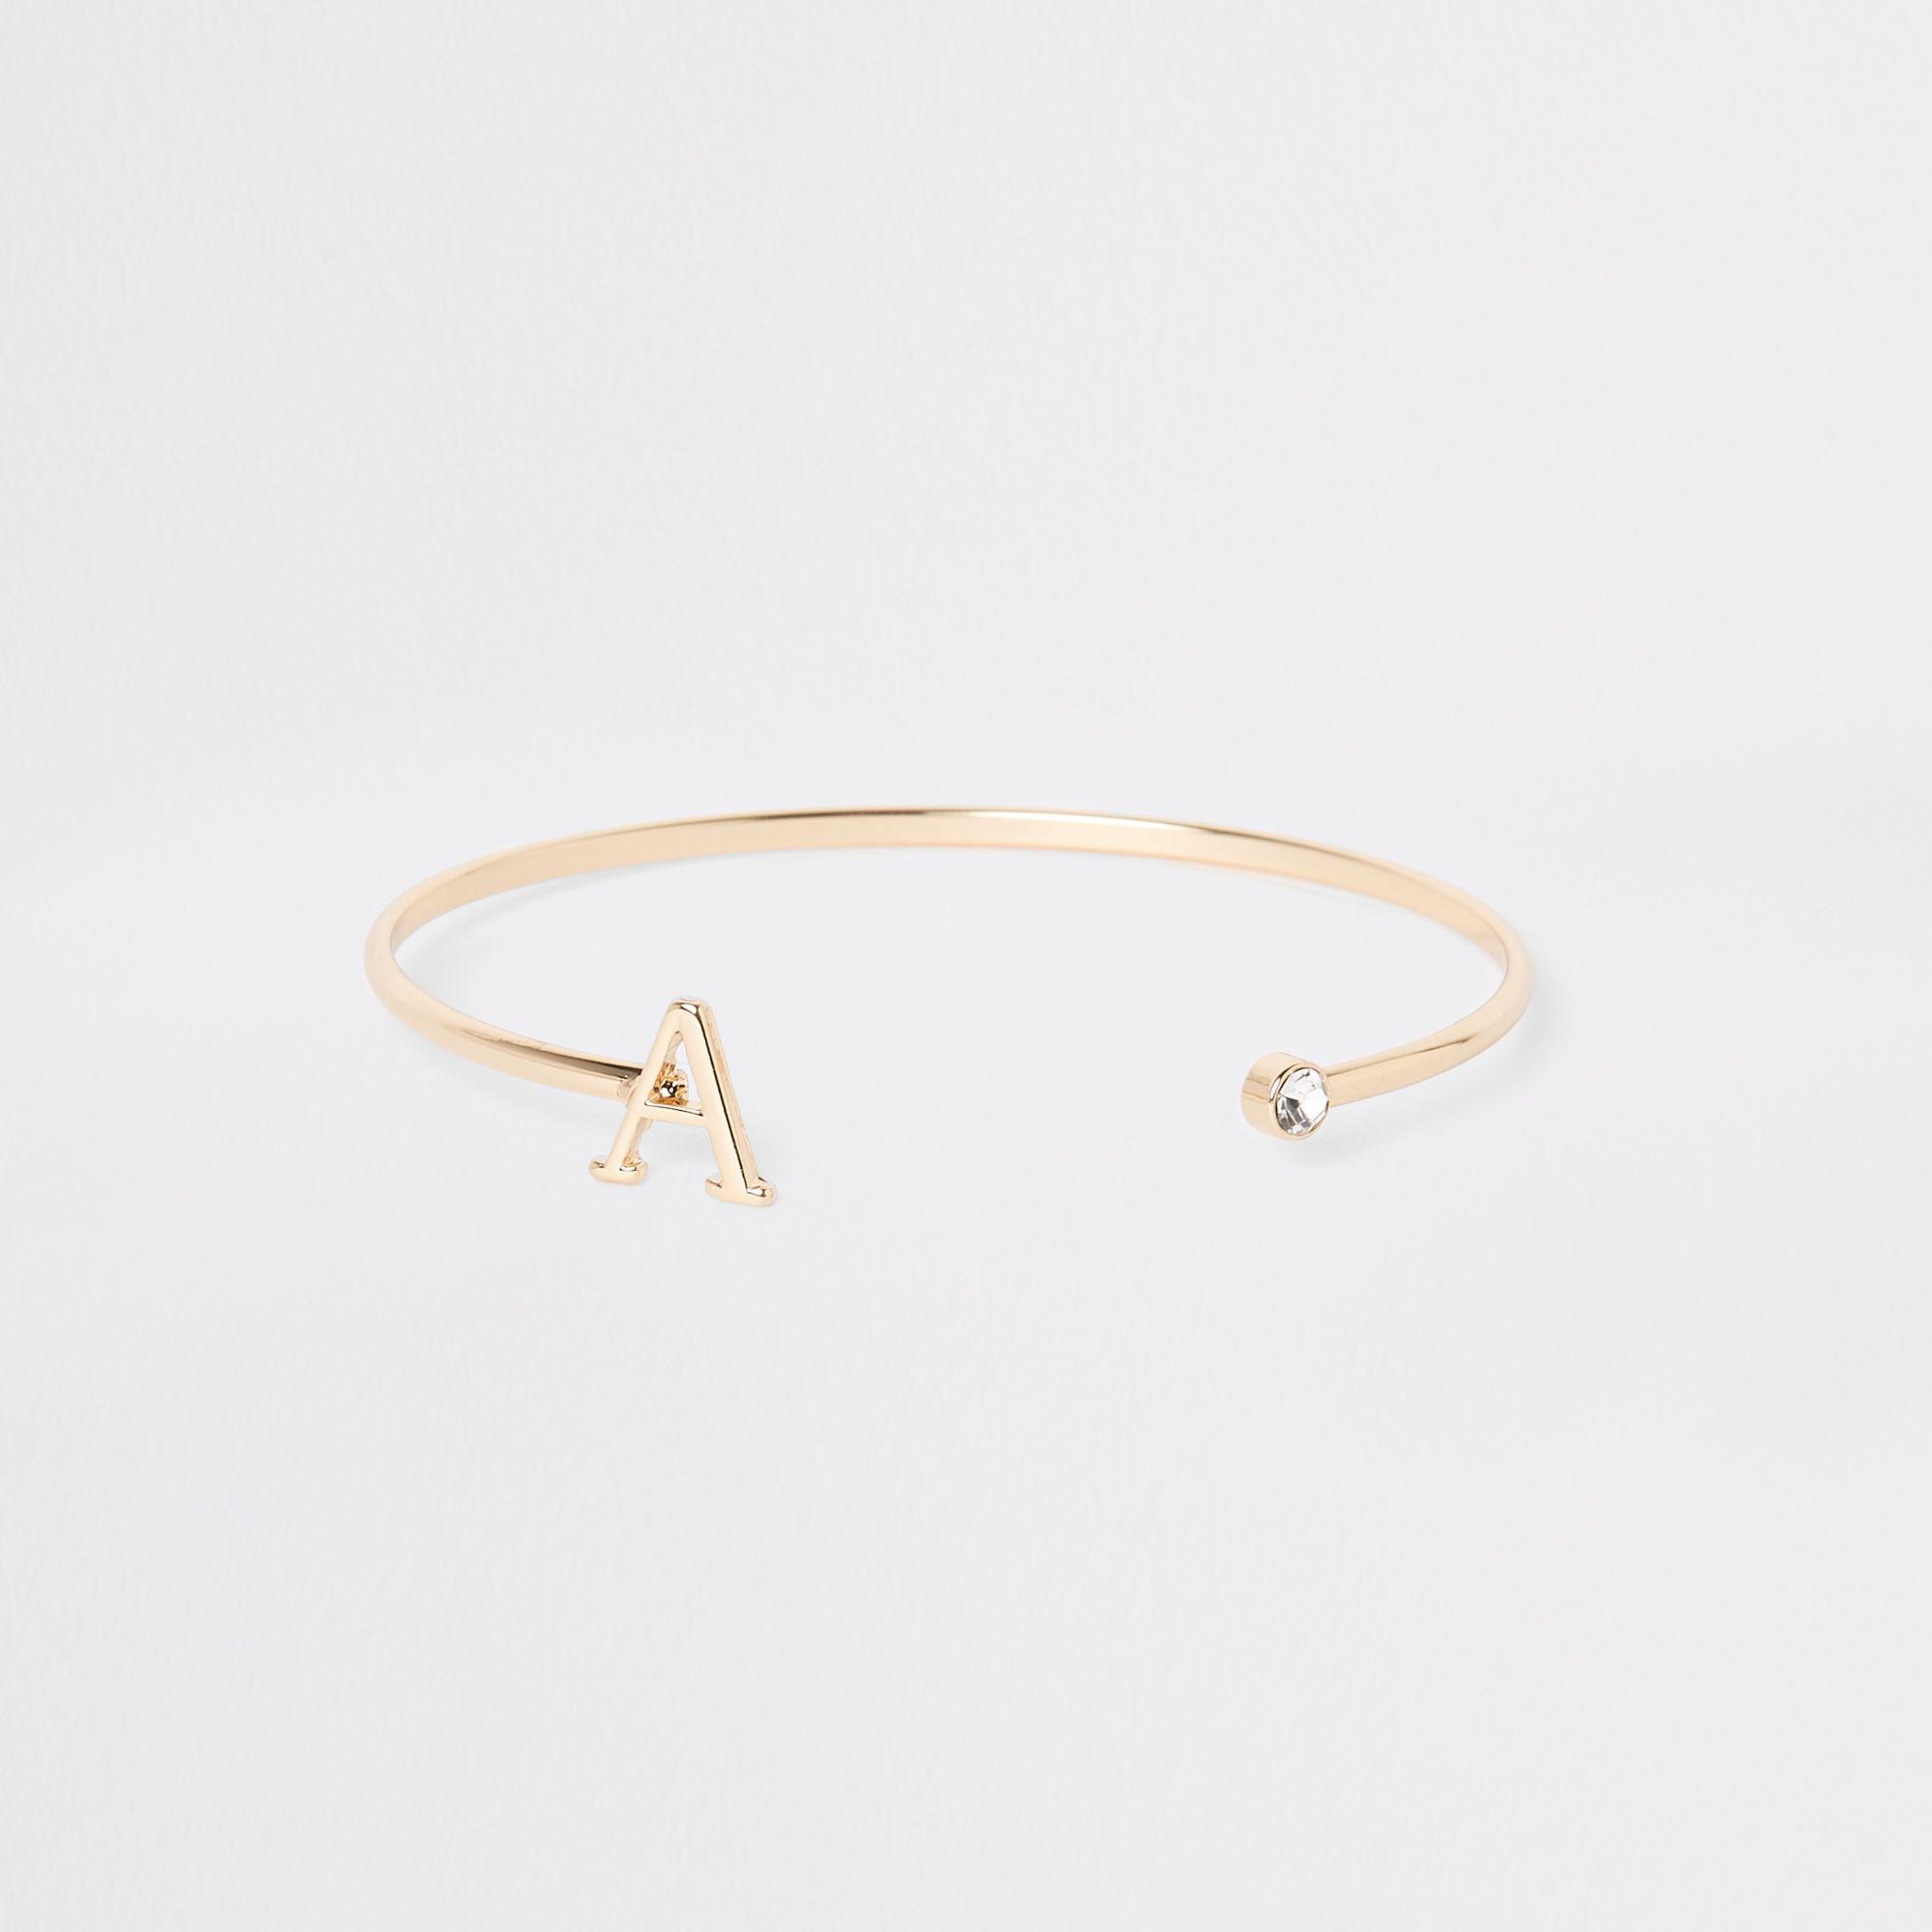 River Island Women S Metallic Plated A Initial Cuff Bracelet